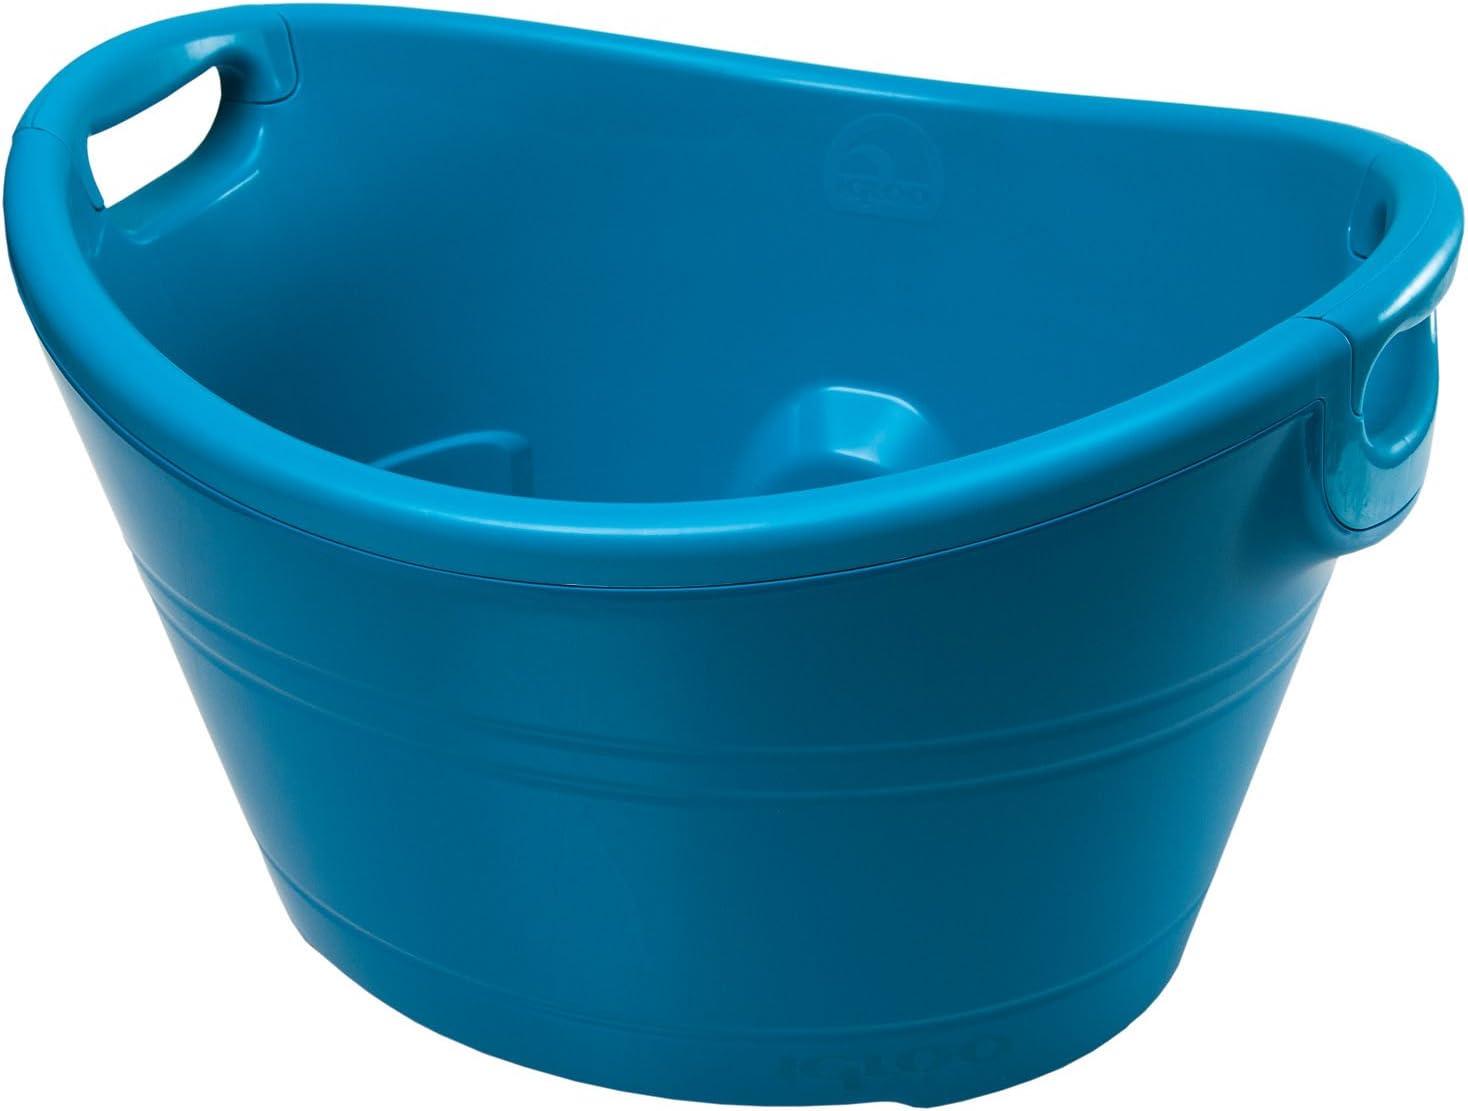 Igloo Party Bucket Cooler